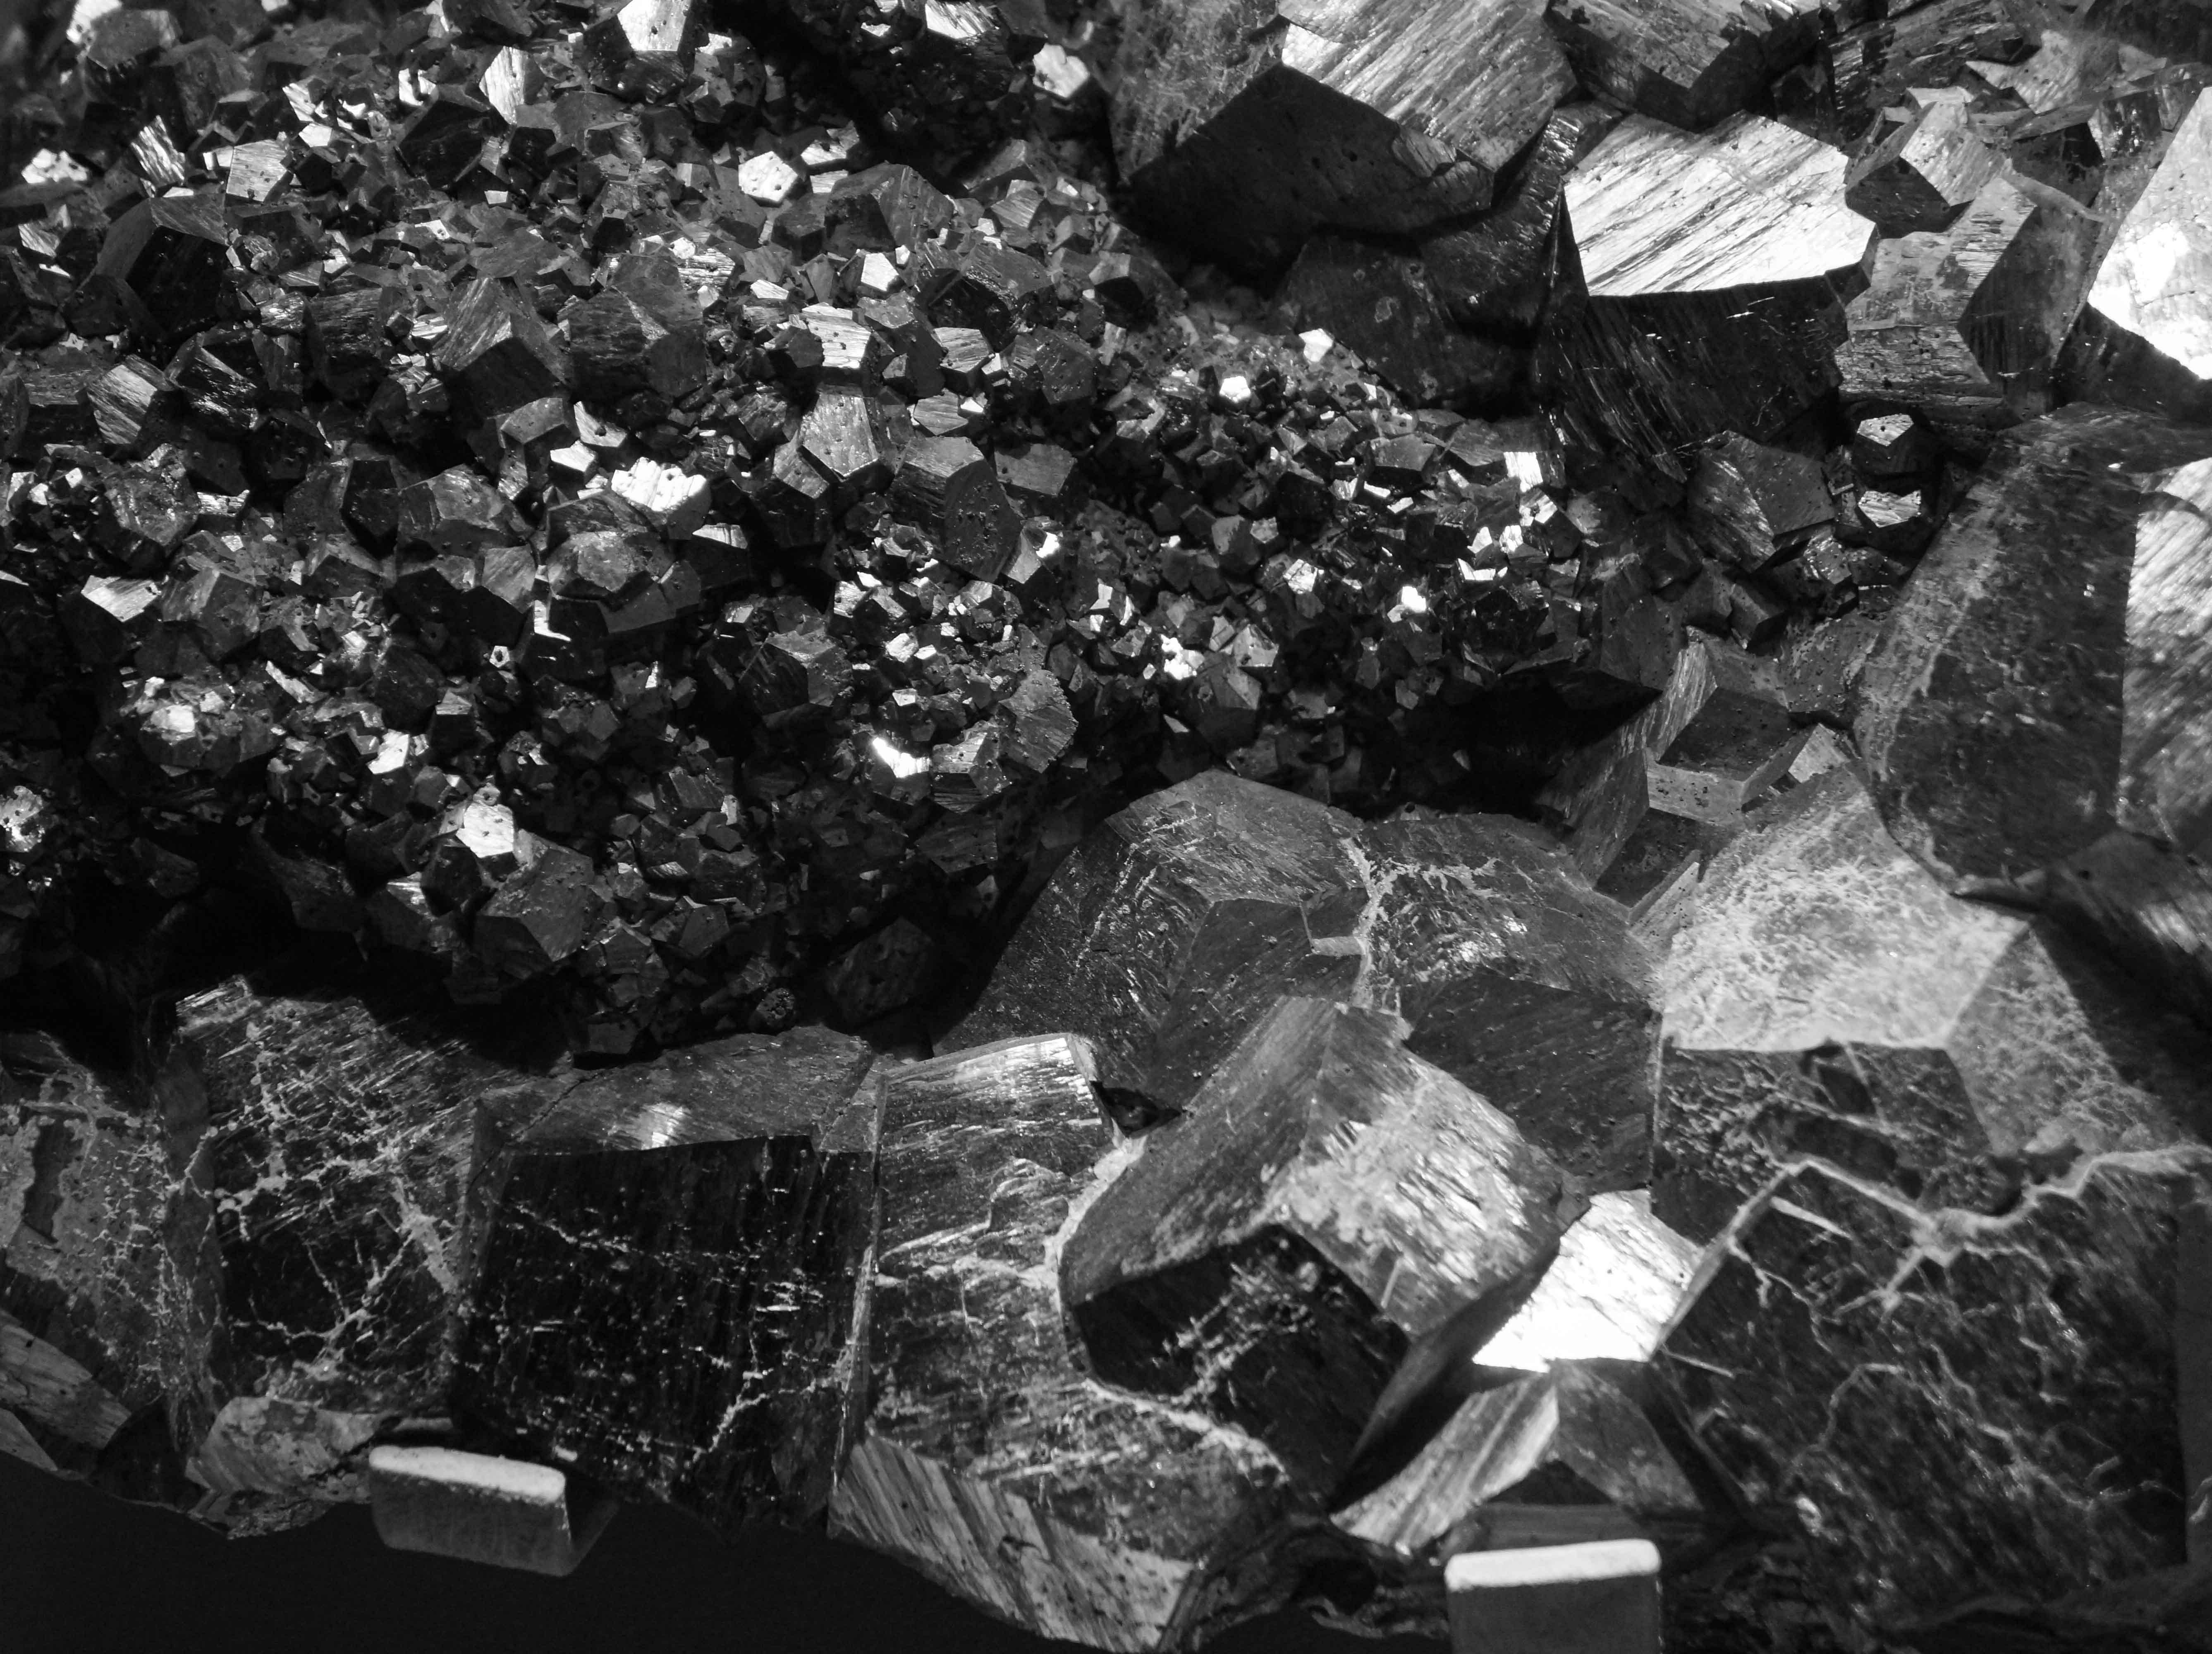 Black & White « Films, photography, art, etc.